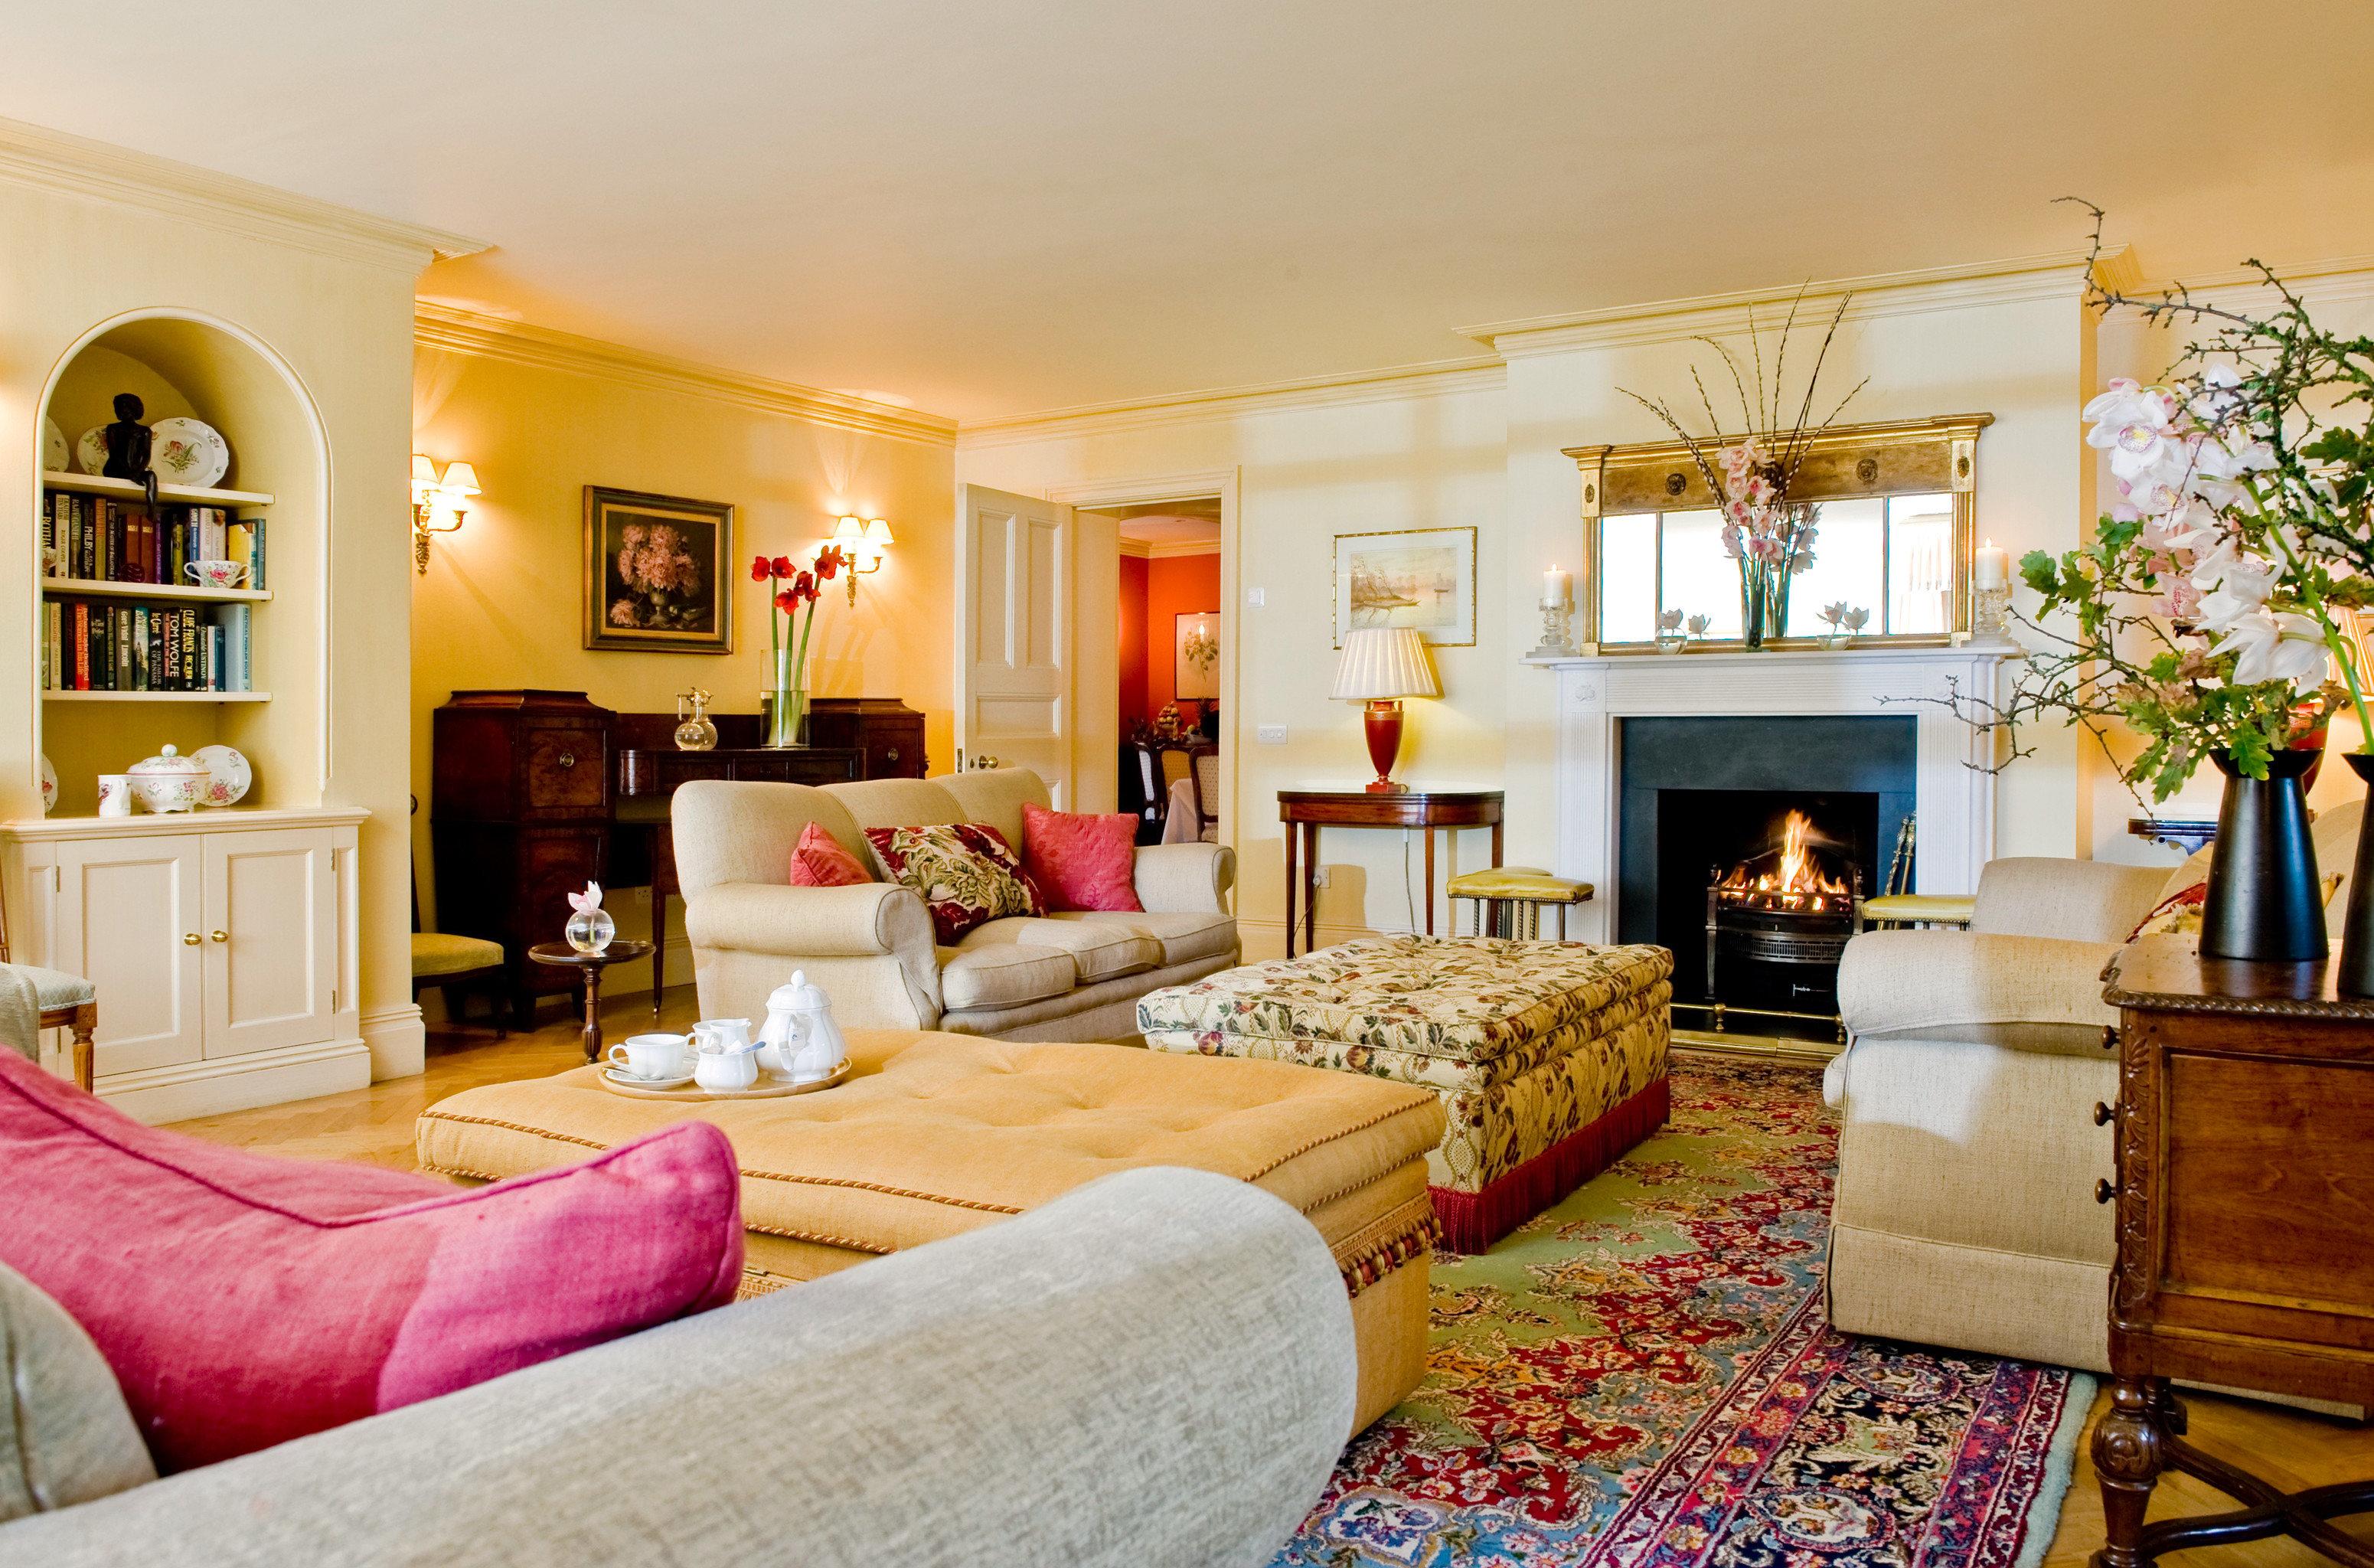 Fireplace Lounge Luxury Romantic Rustic sofa living room property home Suite Villa mansion cottage farmhouse